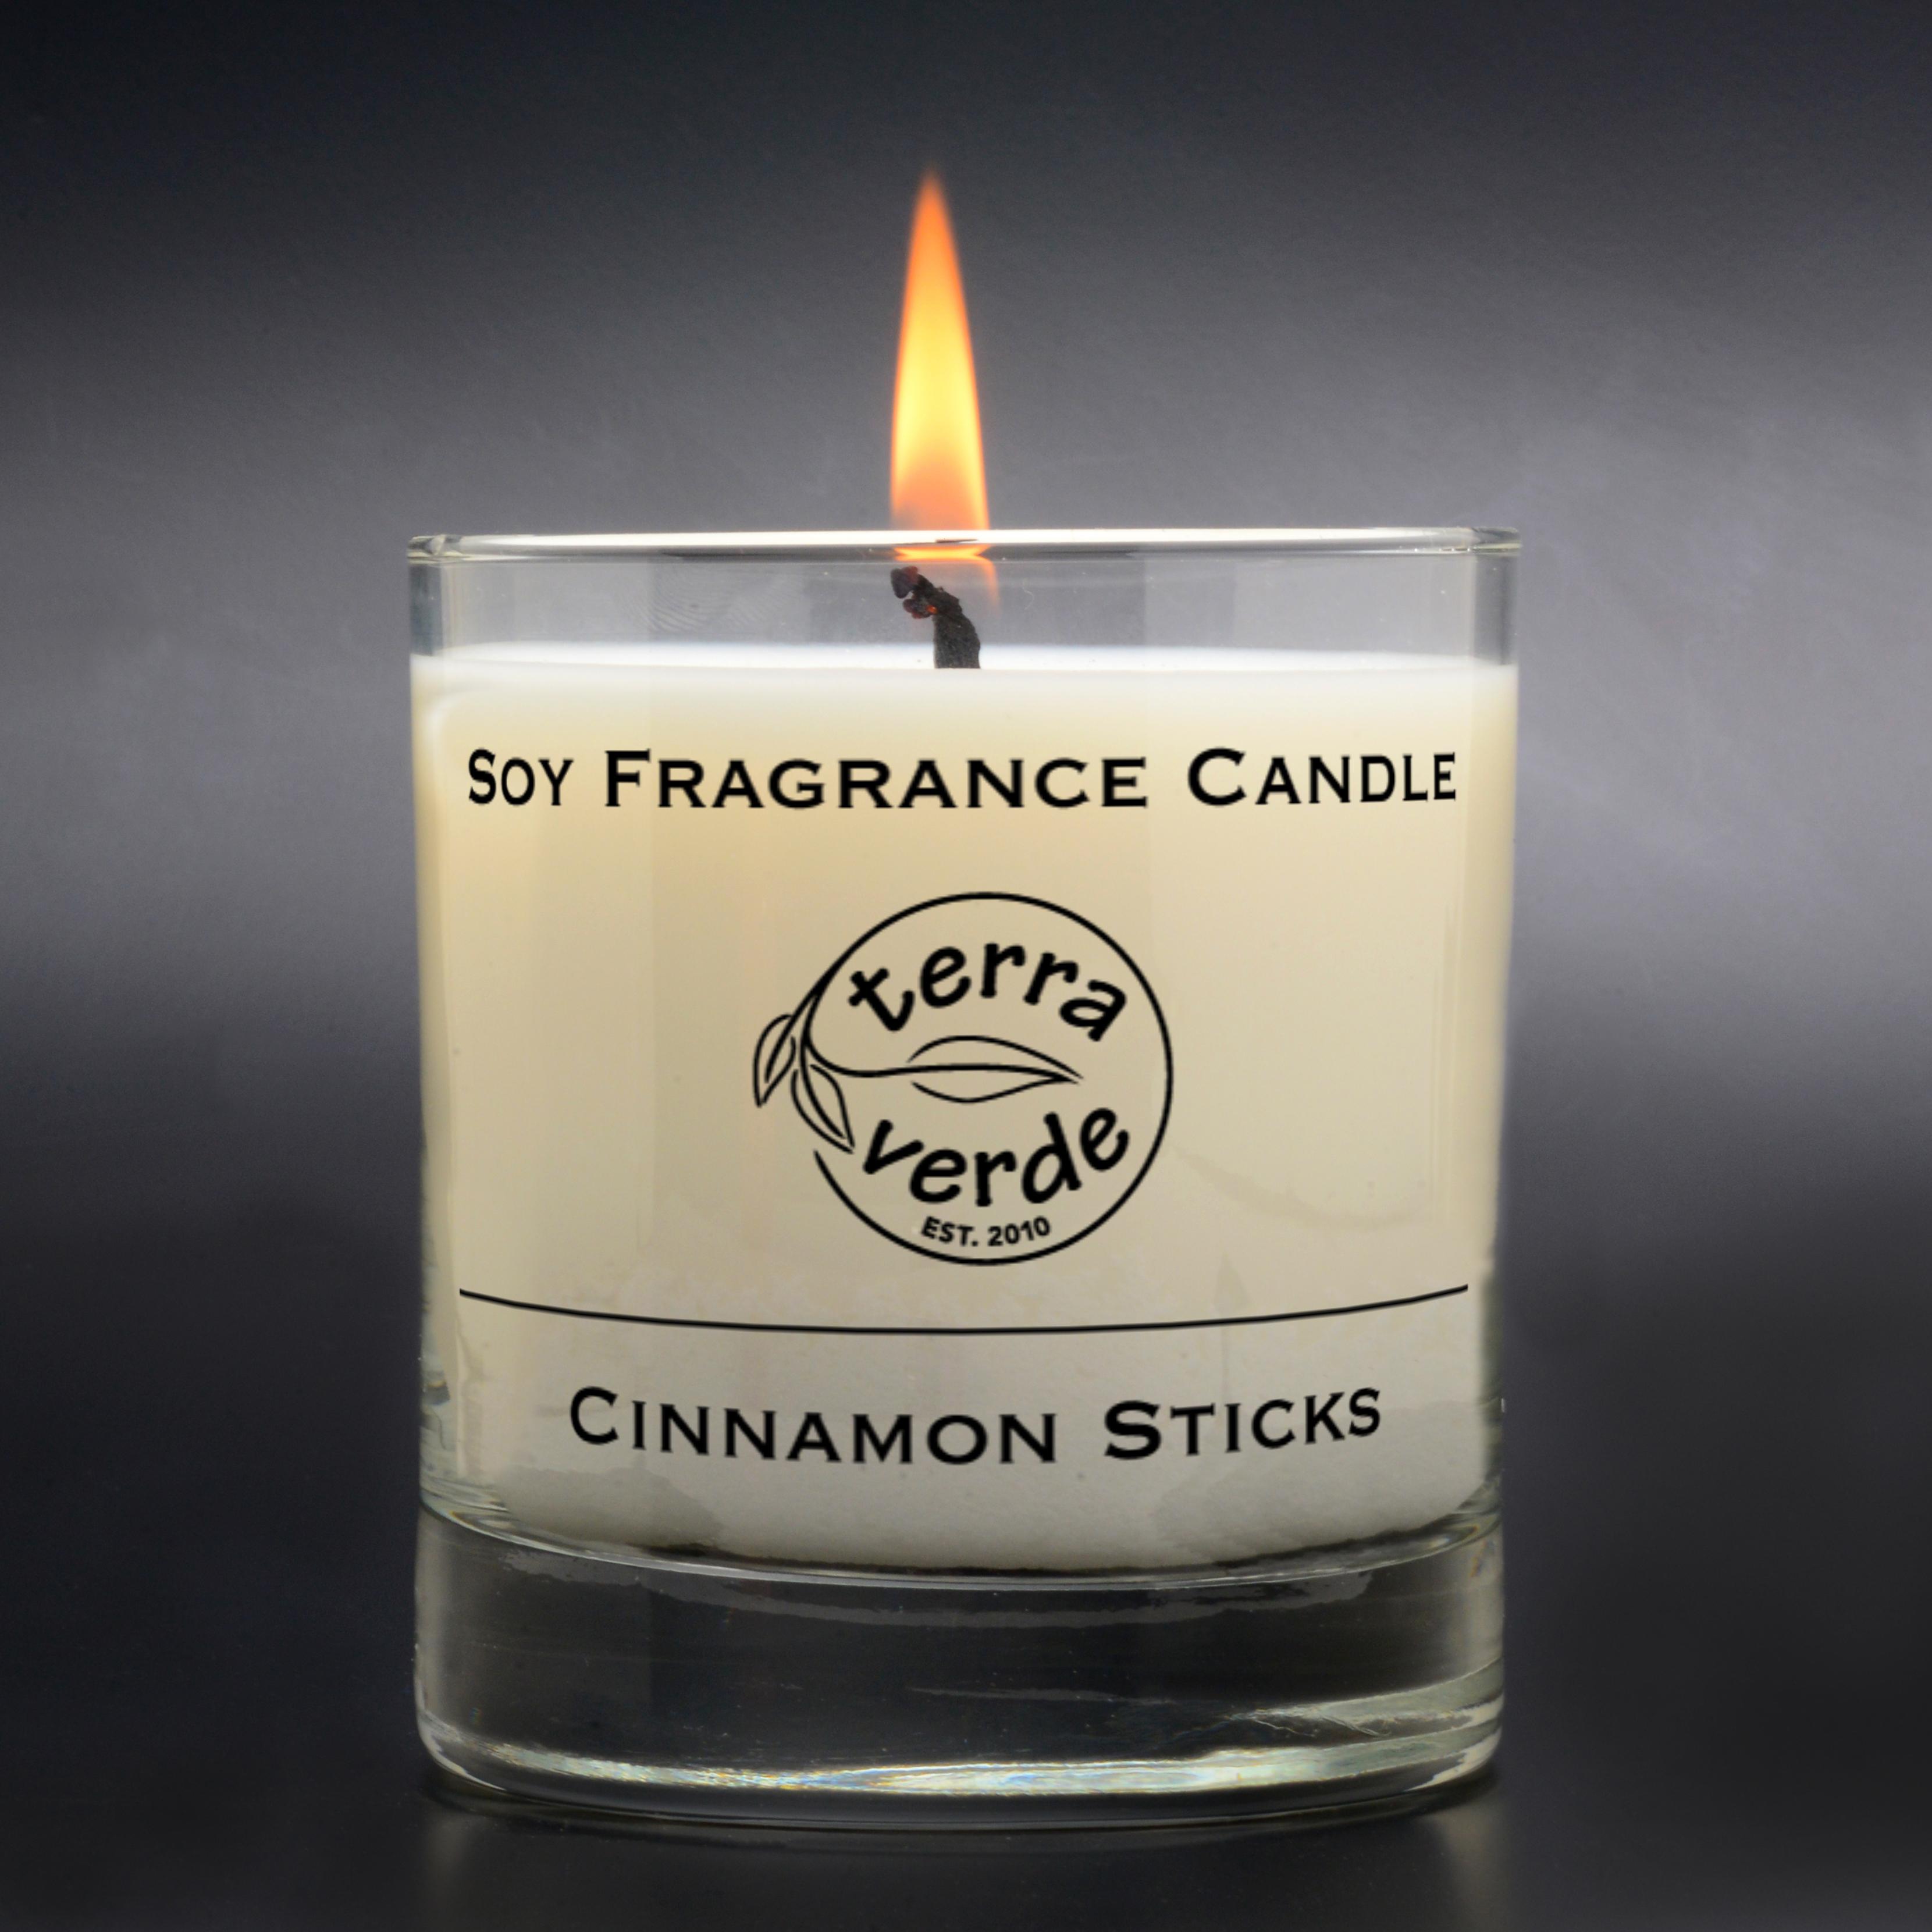 Cinnamon Sticks 8oz Soy Candle